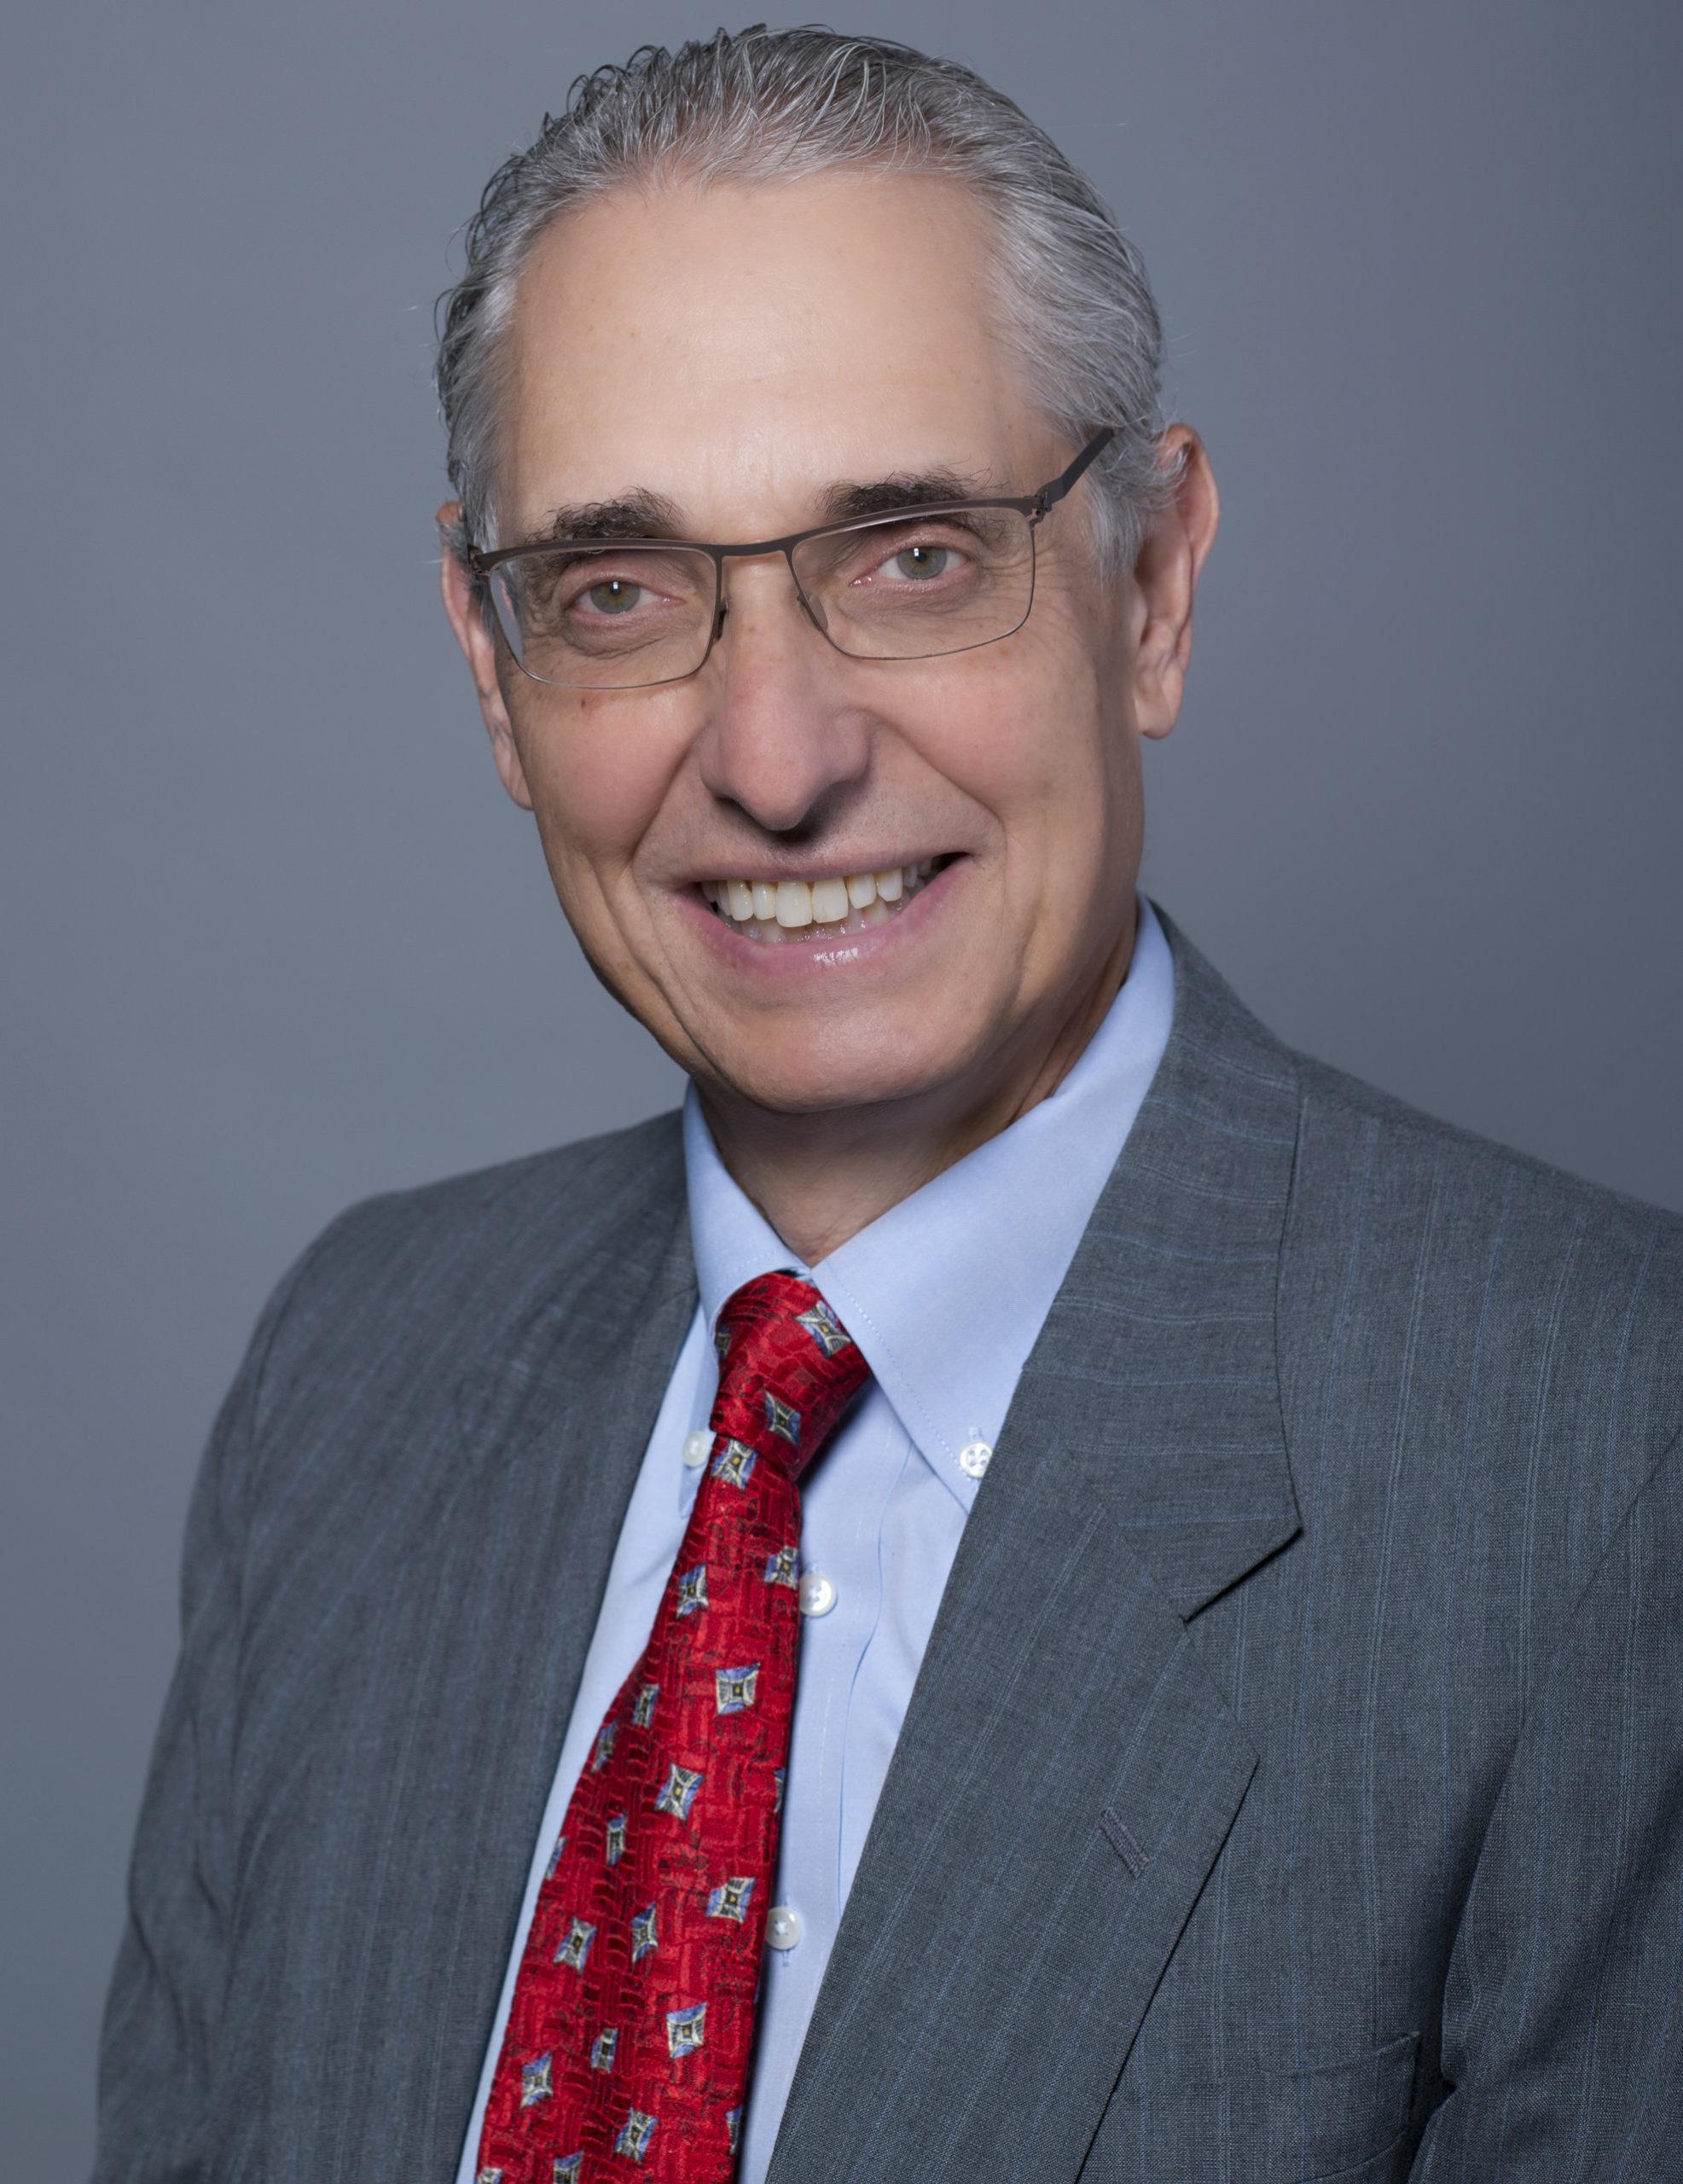 Tom Uhlman